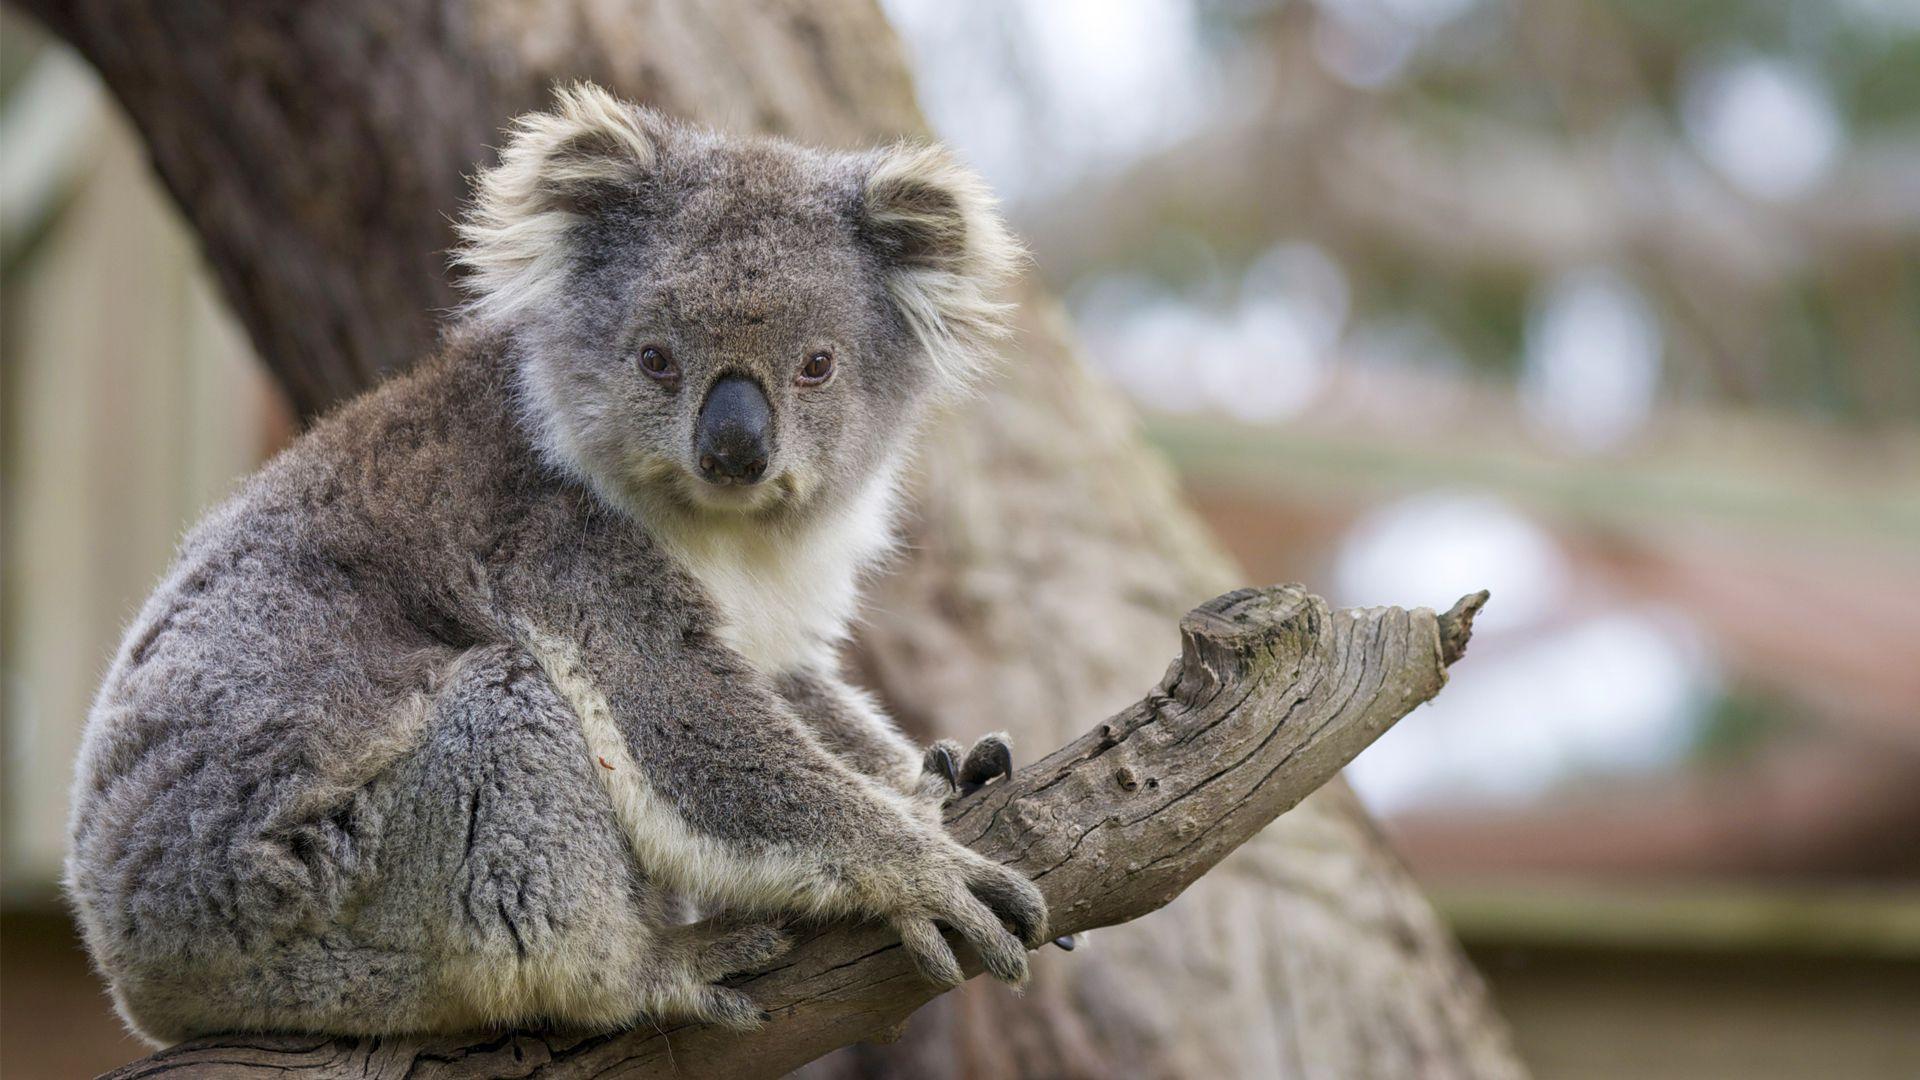 Koalas Beautiful Photo In Australia